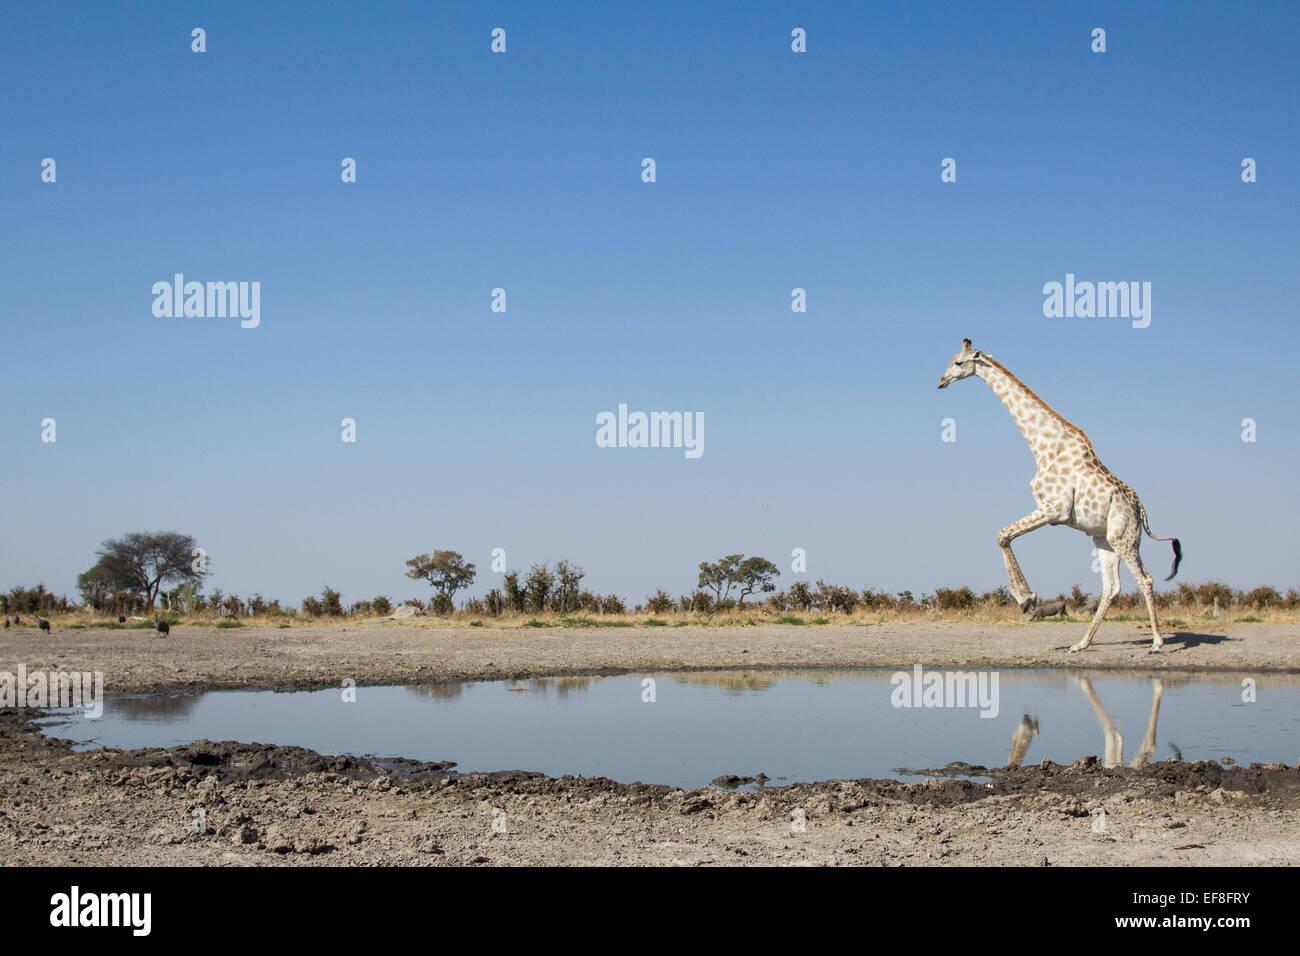 L'Afrique, Botswana, Chobe National Park, la Girafe (Giraffa camelopardalis) pas loin du bord du trou dans l'eau Photo Stock